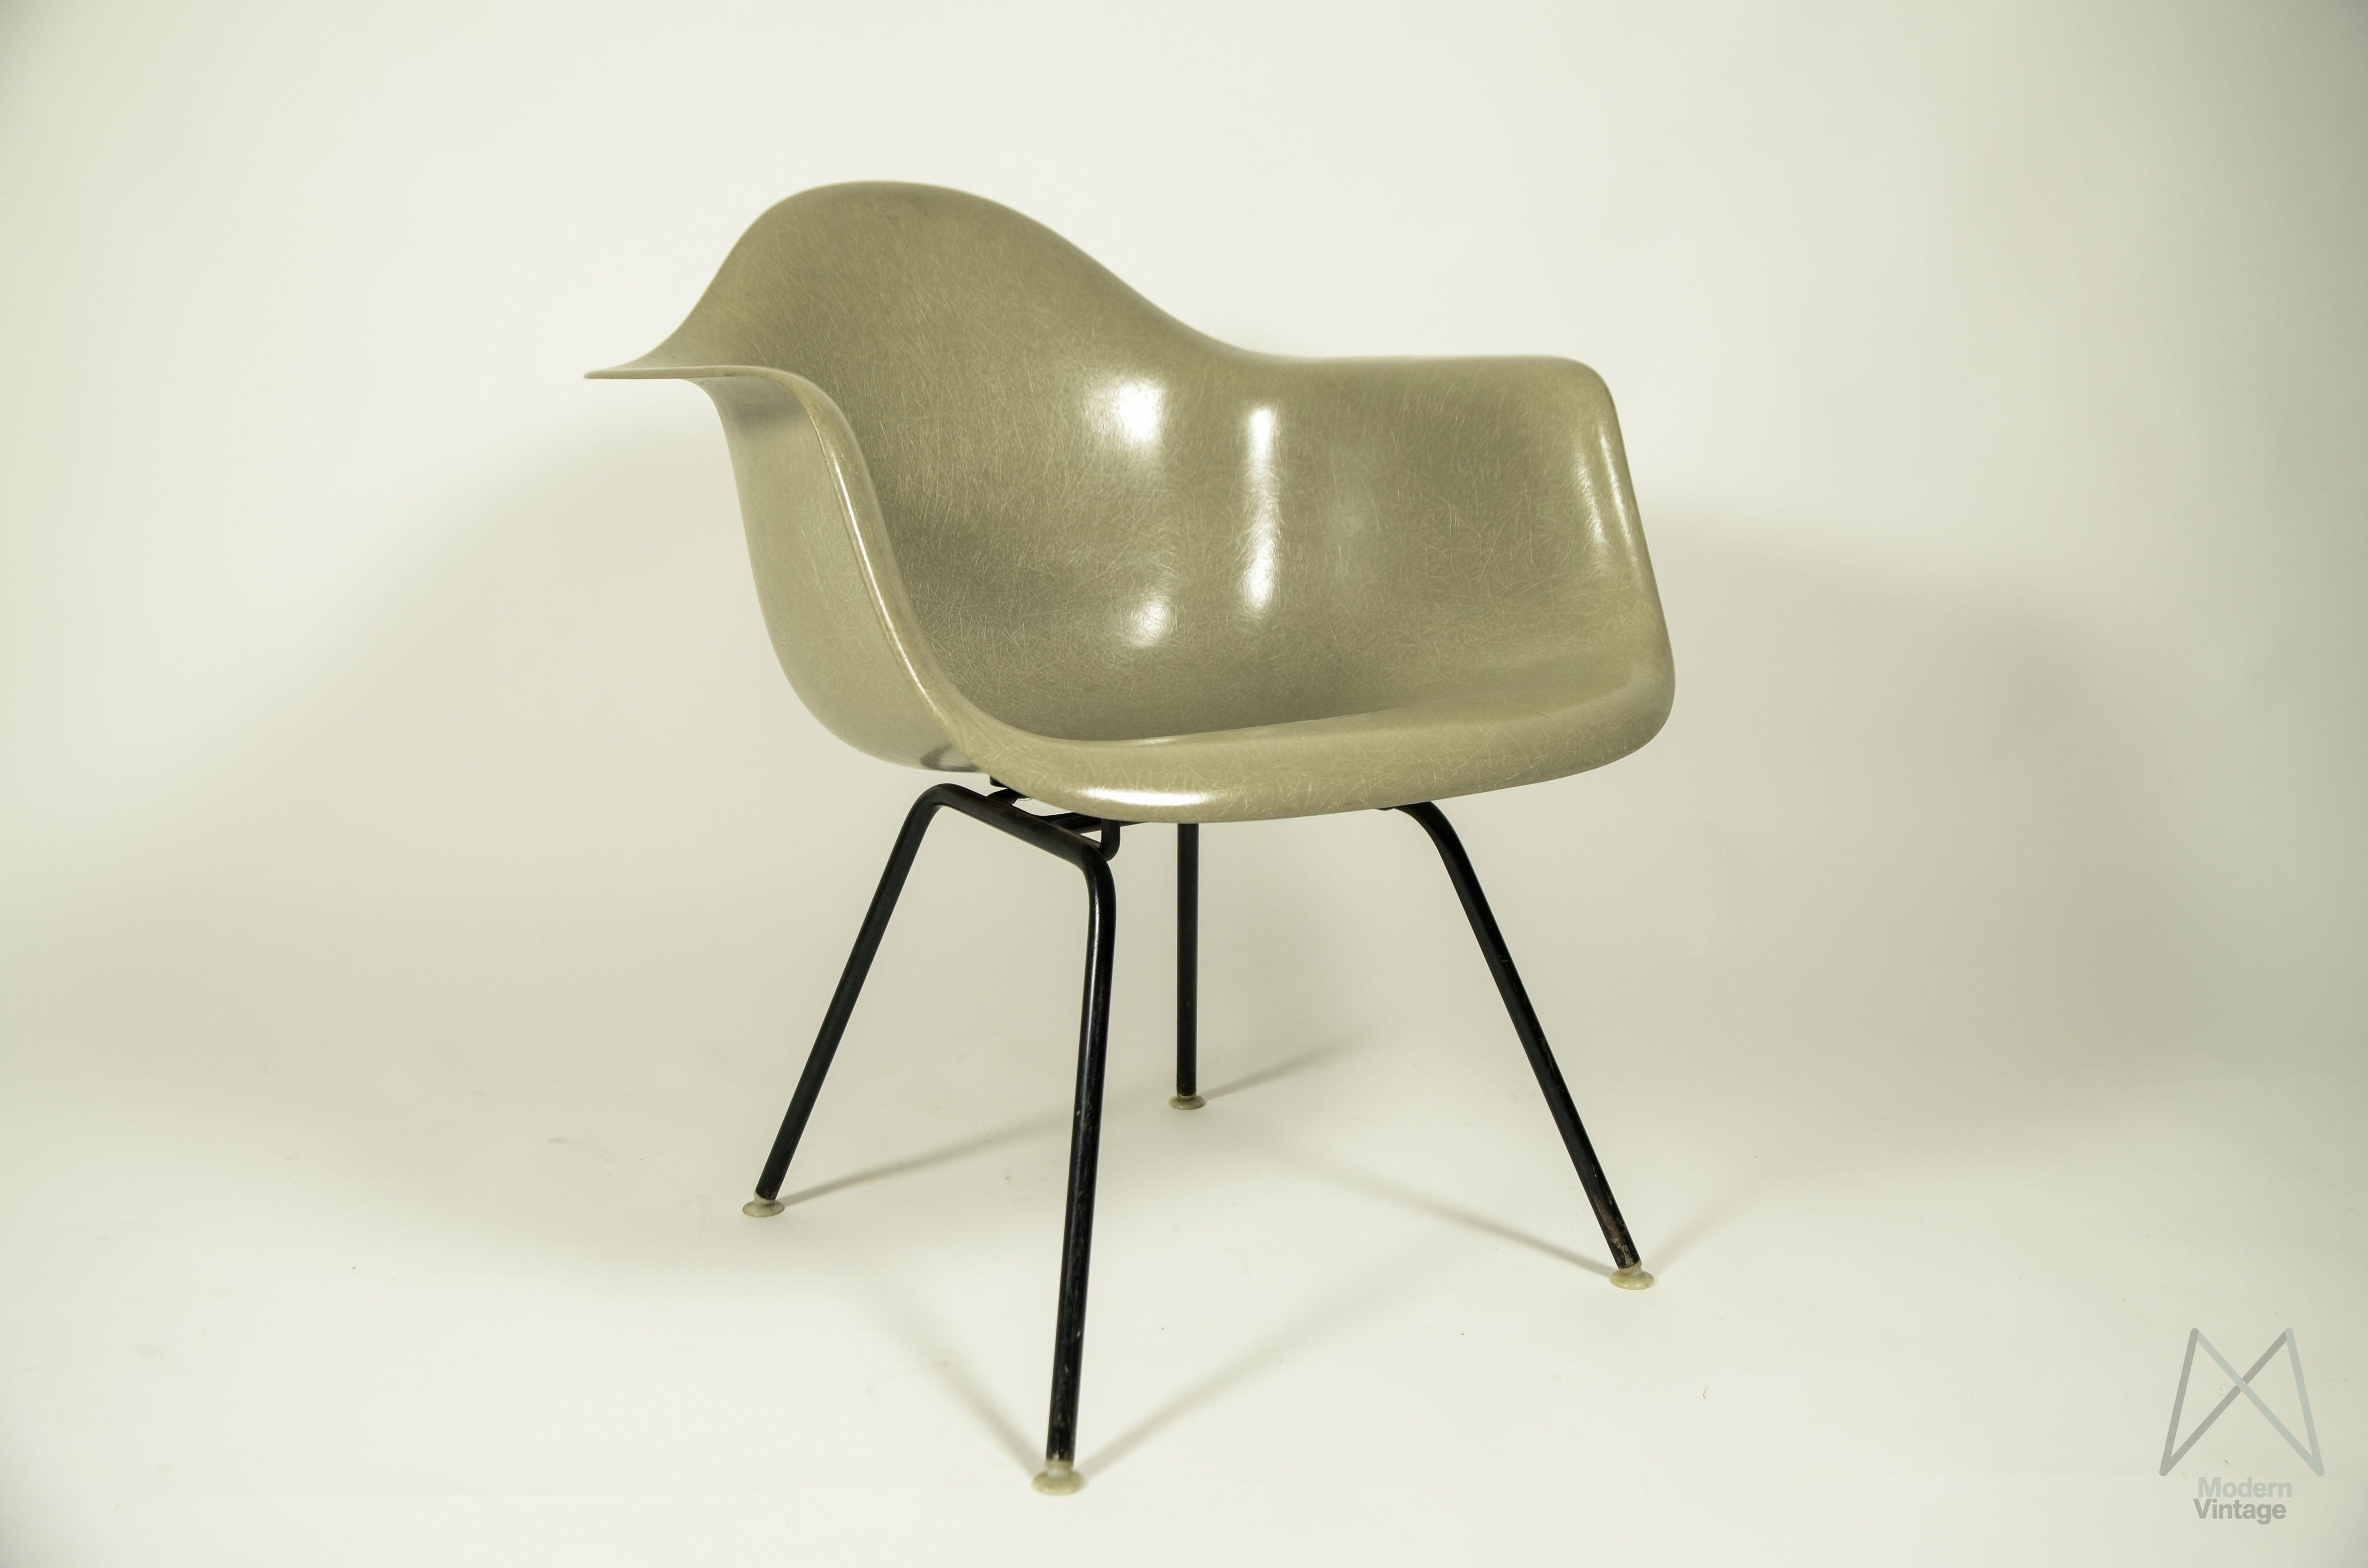 sthle kaufen fabulous image of eames hm lax greige grey stoel kopen stuhle kaufen chaise. Black Bedroom Furniture Sets. Home Design Ideas